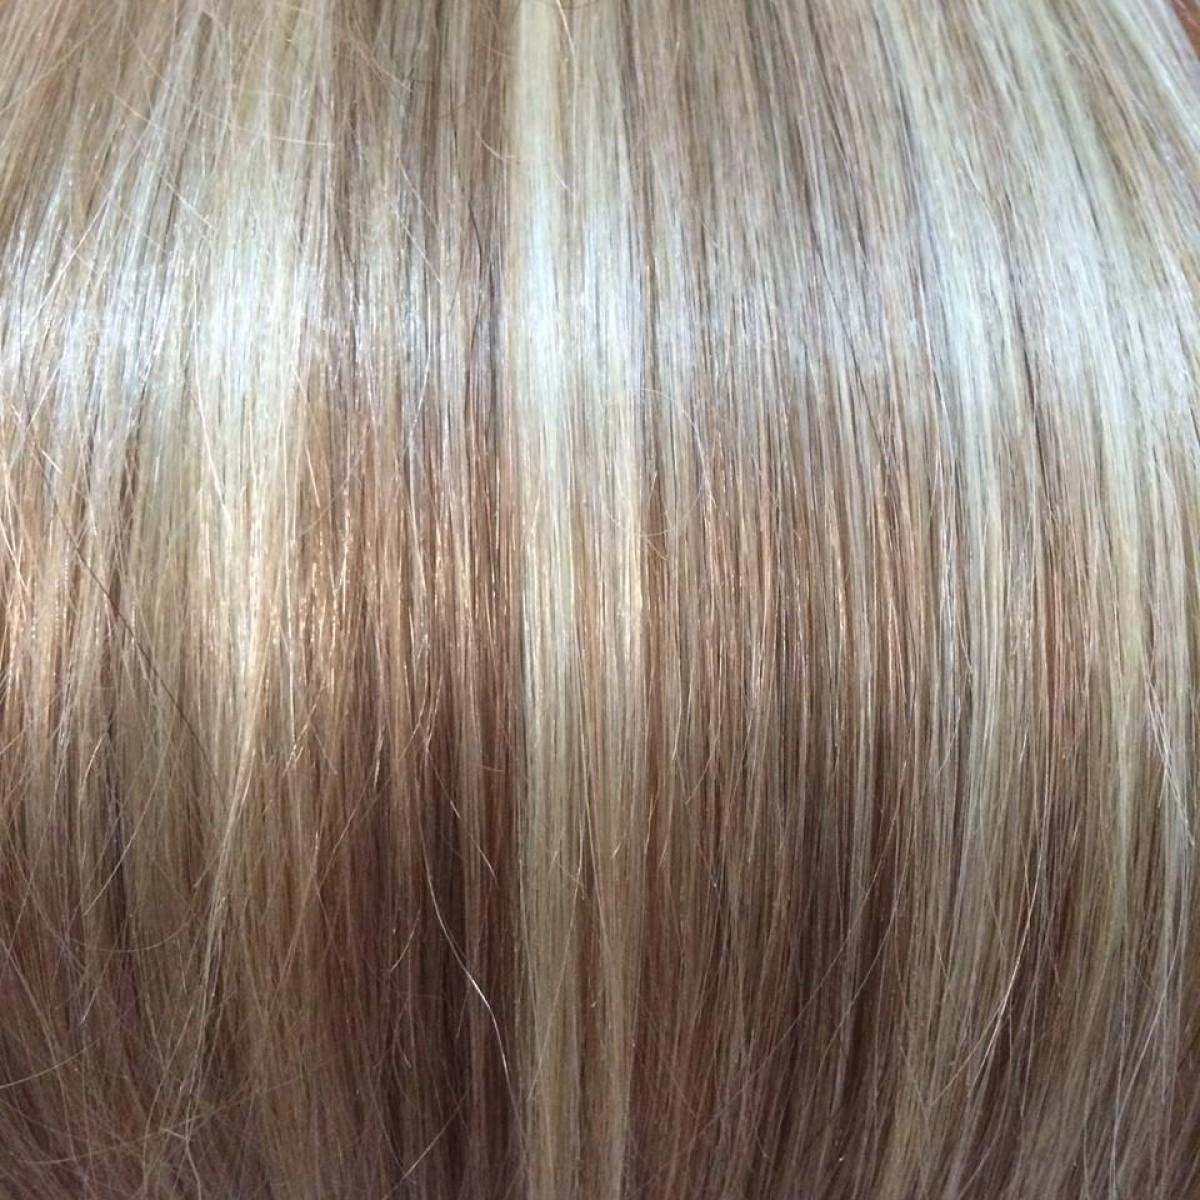 Dark blondebeach blonde highlights 20 inch ultimate thick clip previous next pmusecretfo Choice Image